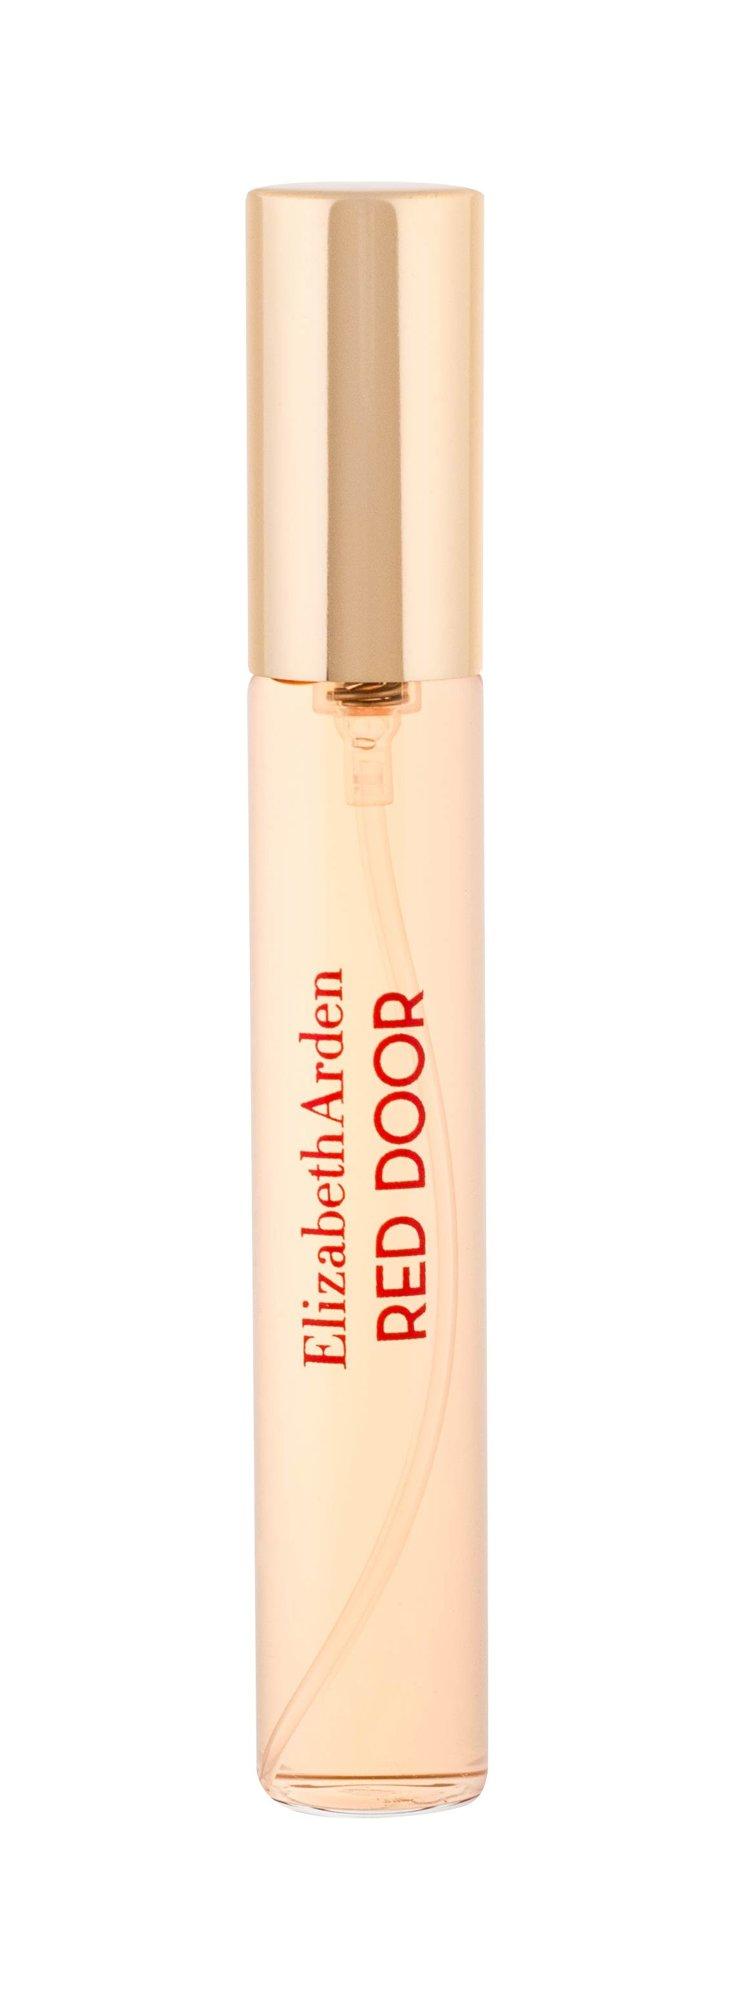 Elizabeth Arden Red Door Limited Edition Eau de Toilette 15ml